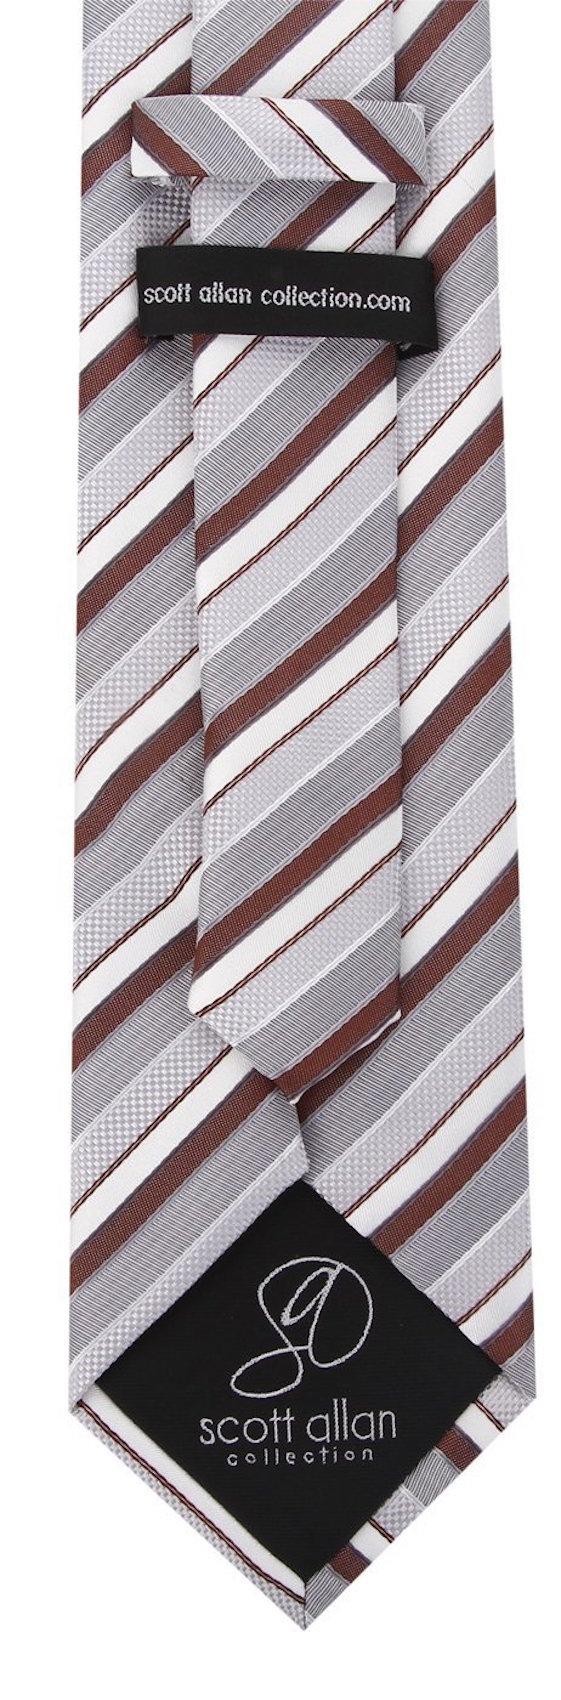 Scott-Allan-Striped-Necktie-Mens-Ties-in-Various-Colors thumbnail 10